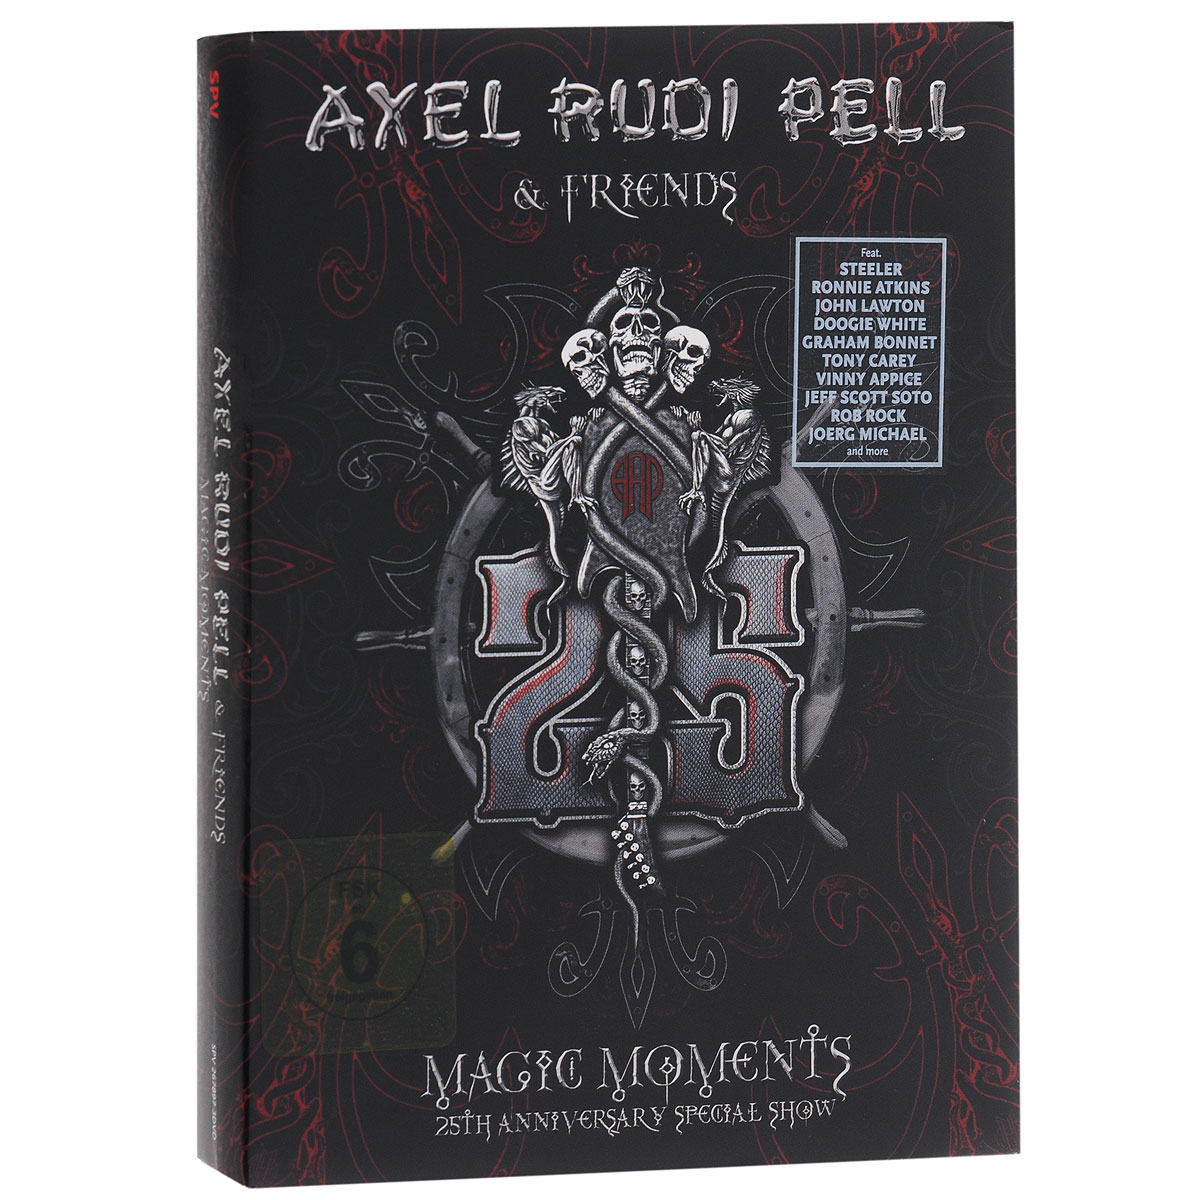 цена Axel Rudi Pell & Friends: Magic Moments. 25th Anniversary Spesial Sgow (3 DVD) онлайн в 2017 году